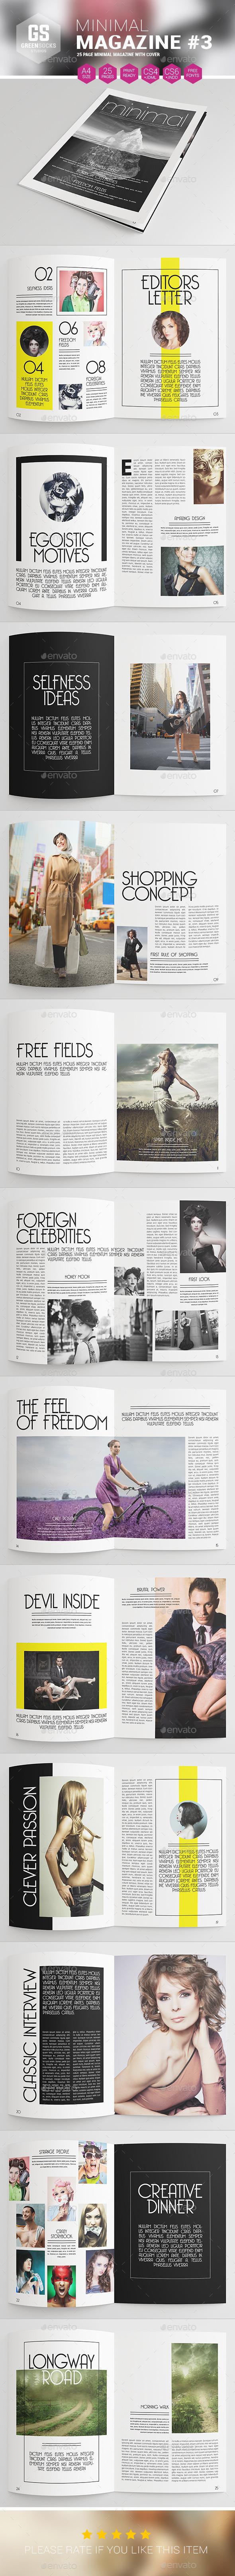 Minimal Magazine #3 - Magazines Print Templates